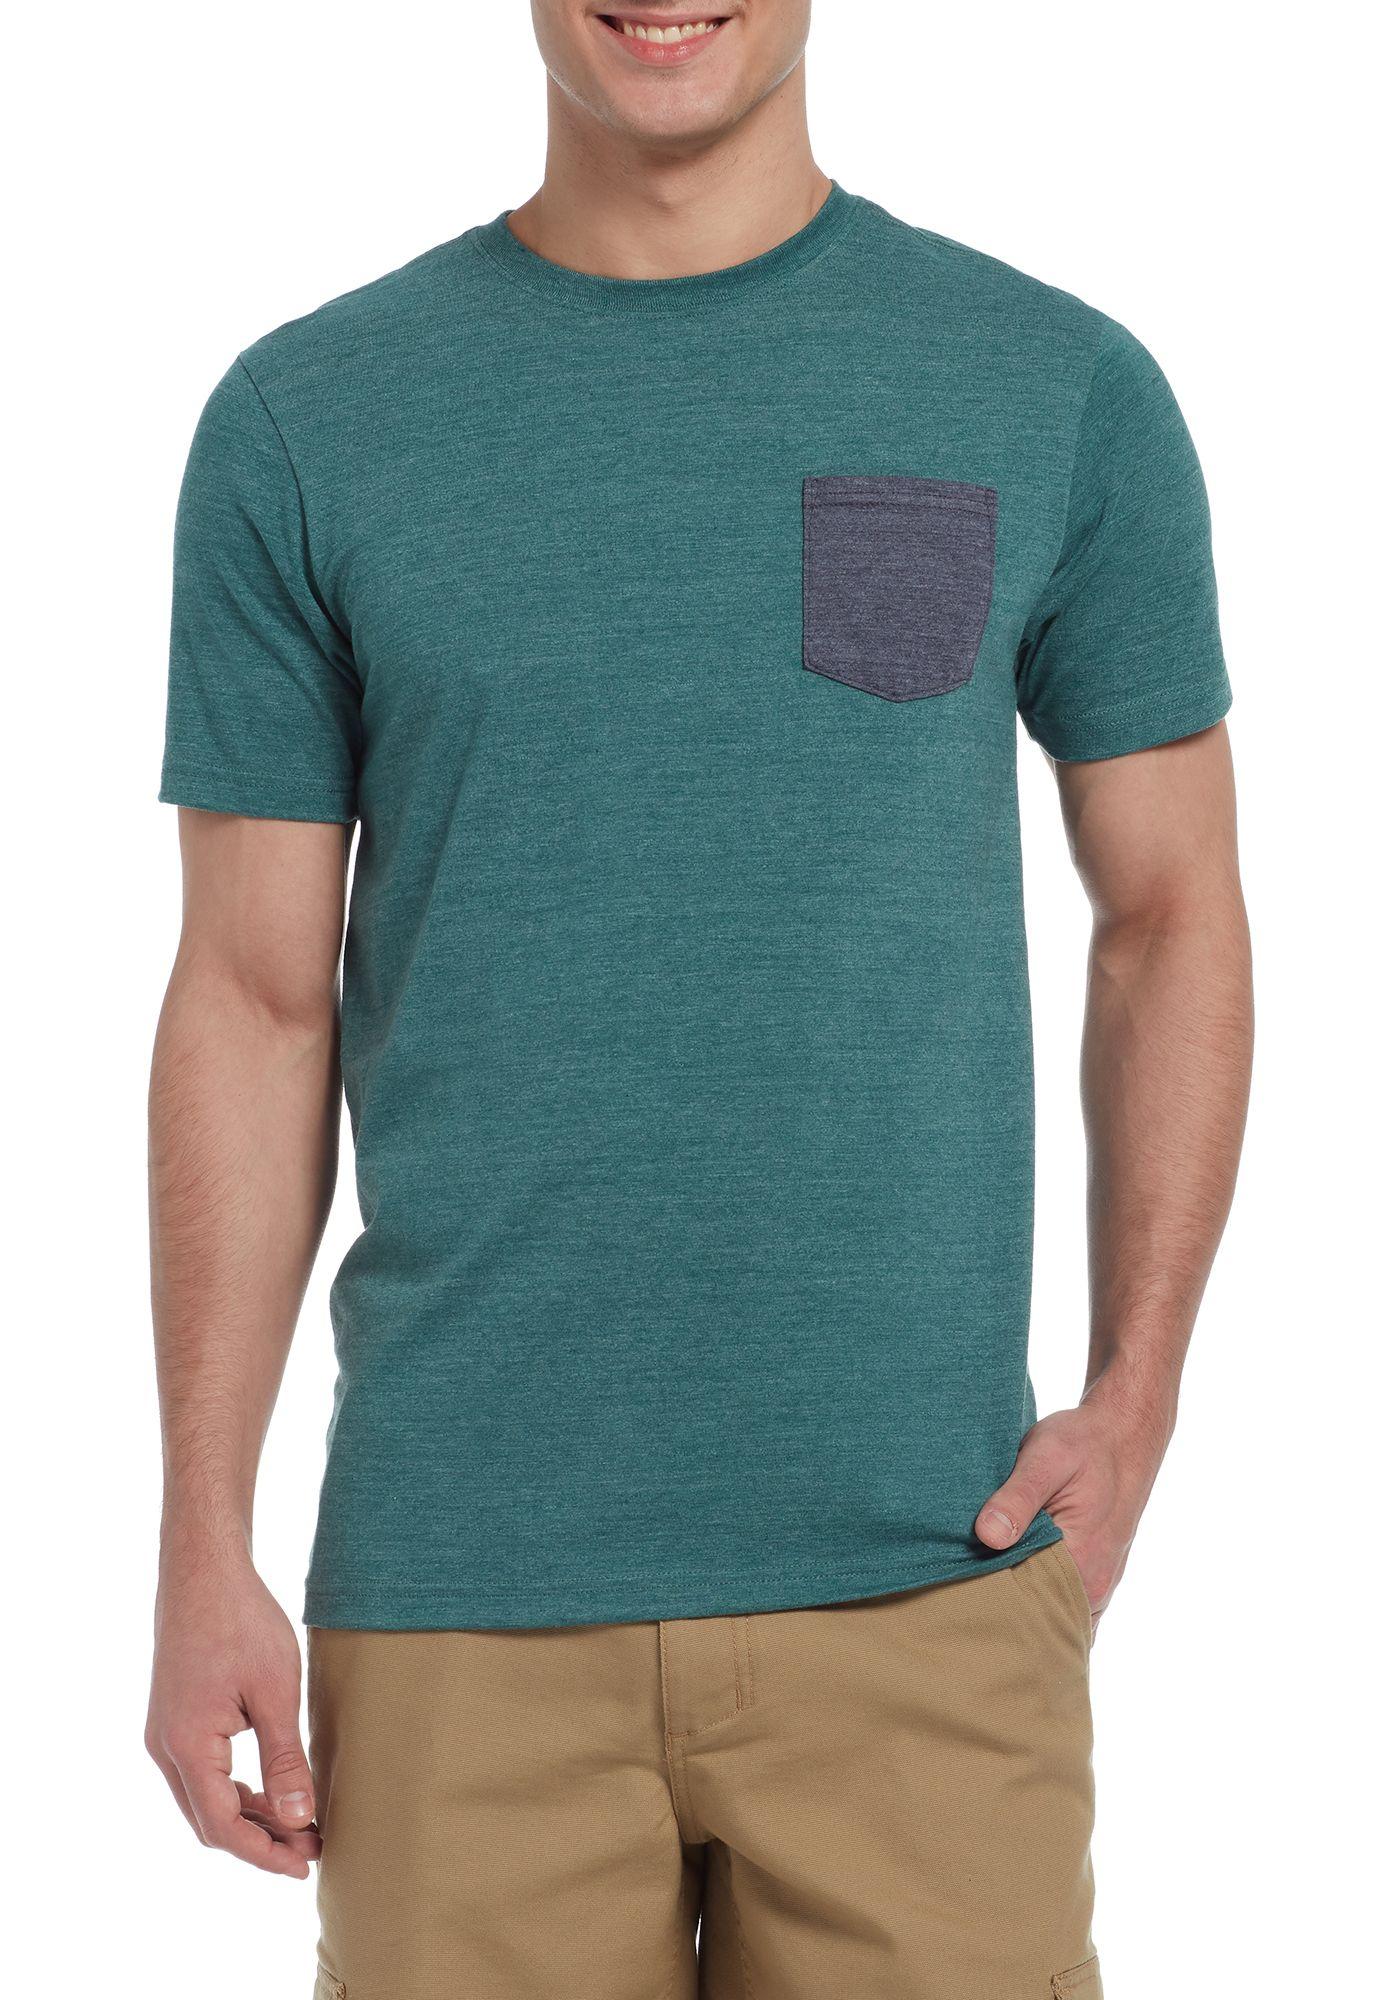 The North Face Men's Tri-Blend Pocket T-Shirt